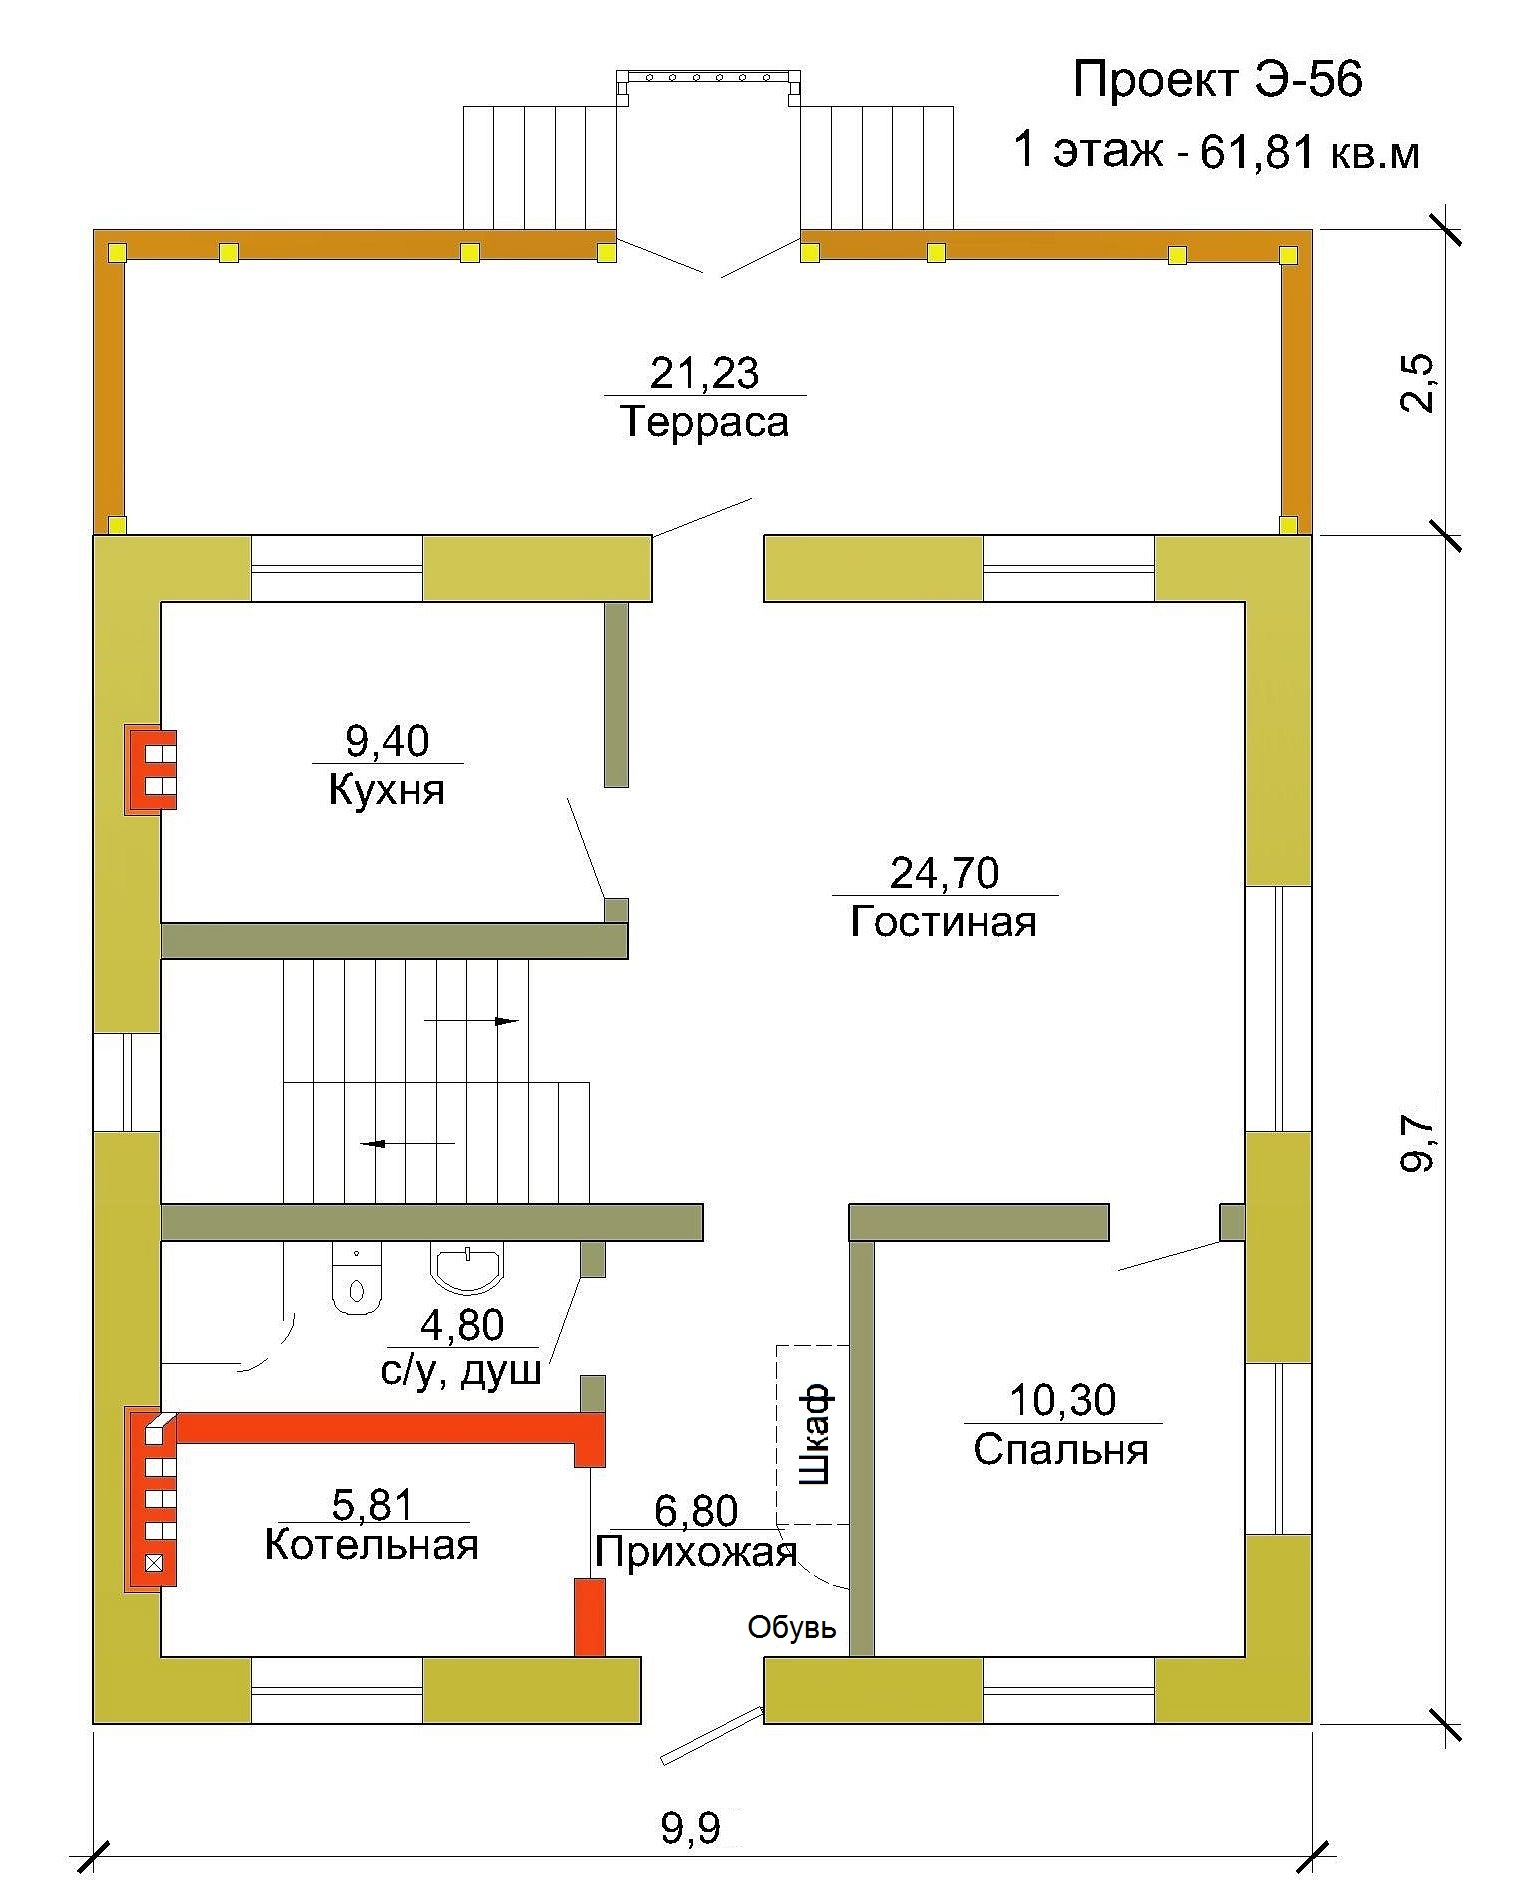 Готовый проект коттеджа 125 м2 / Артикул ЭР-56 план